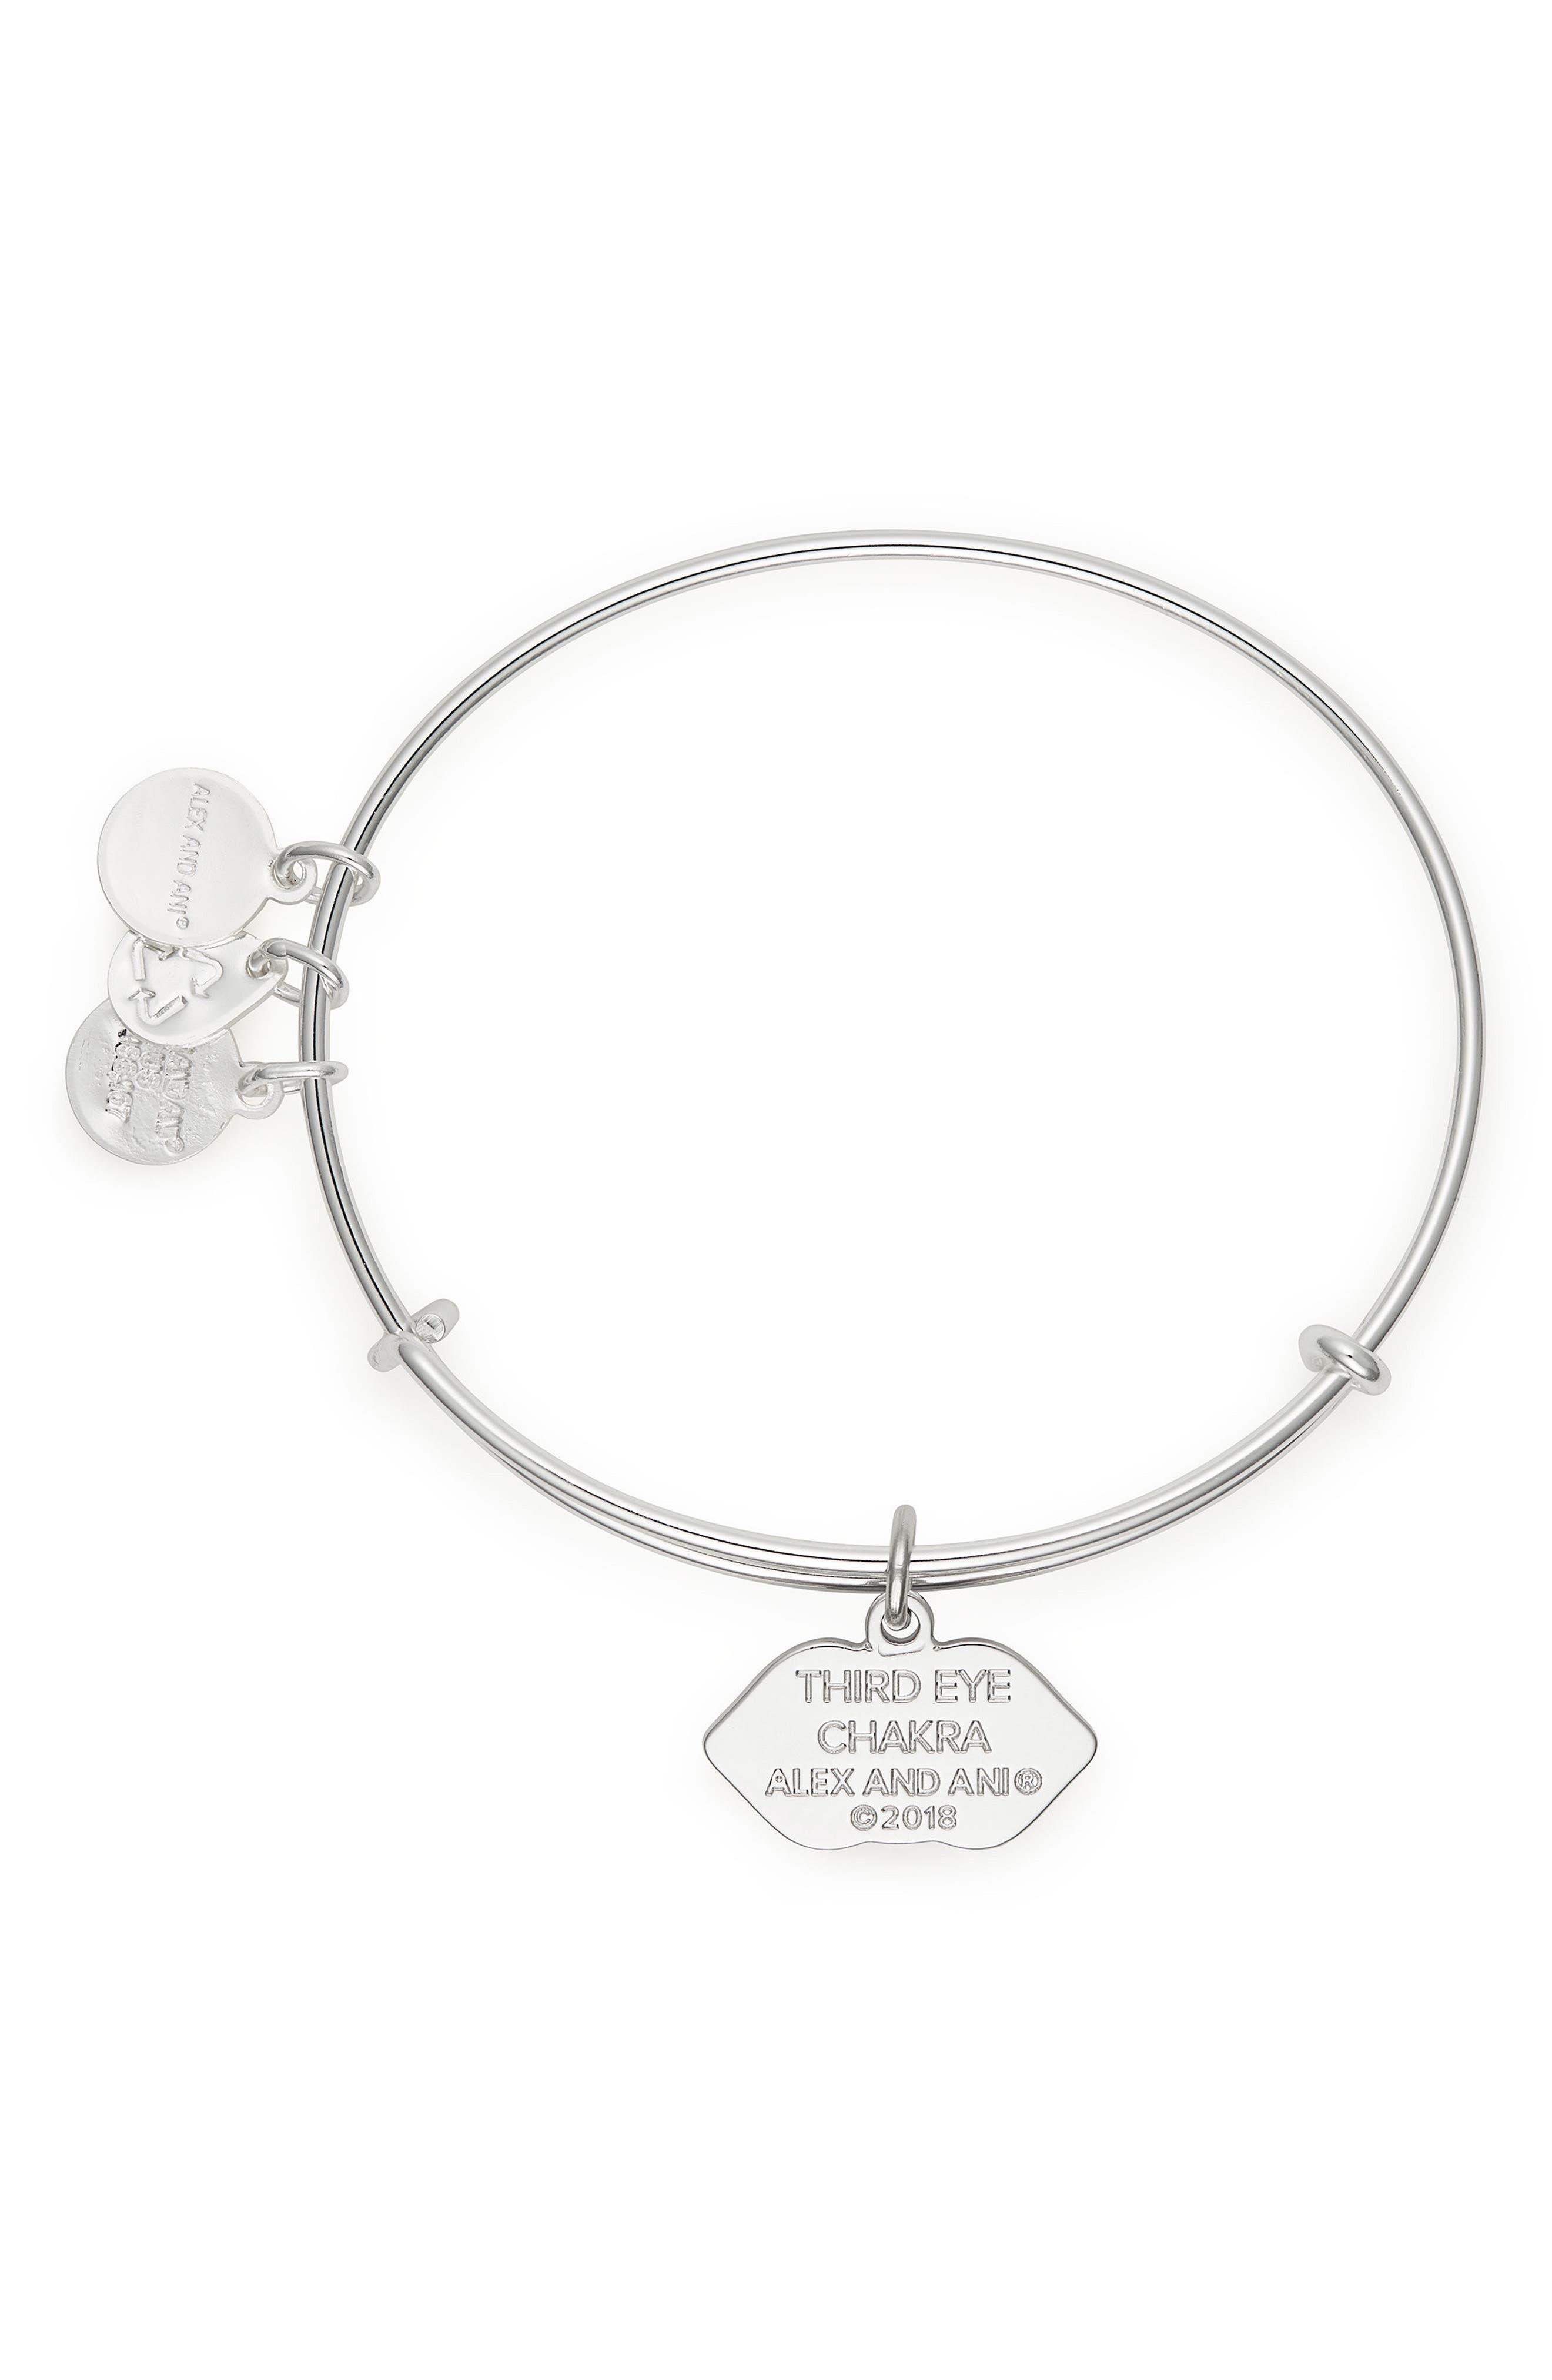 The Third Eye Chakra Adjustable Bracelet,                             Alternate thumbnail 2, color,                             Silver